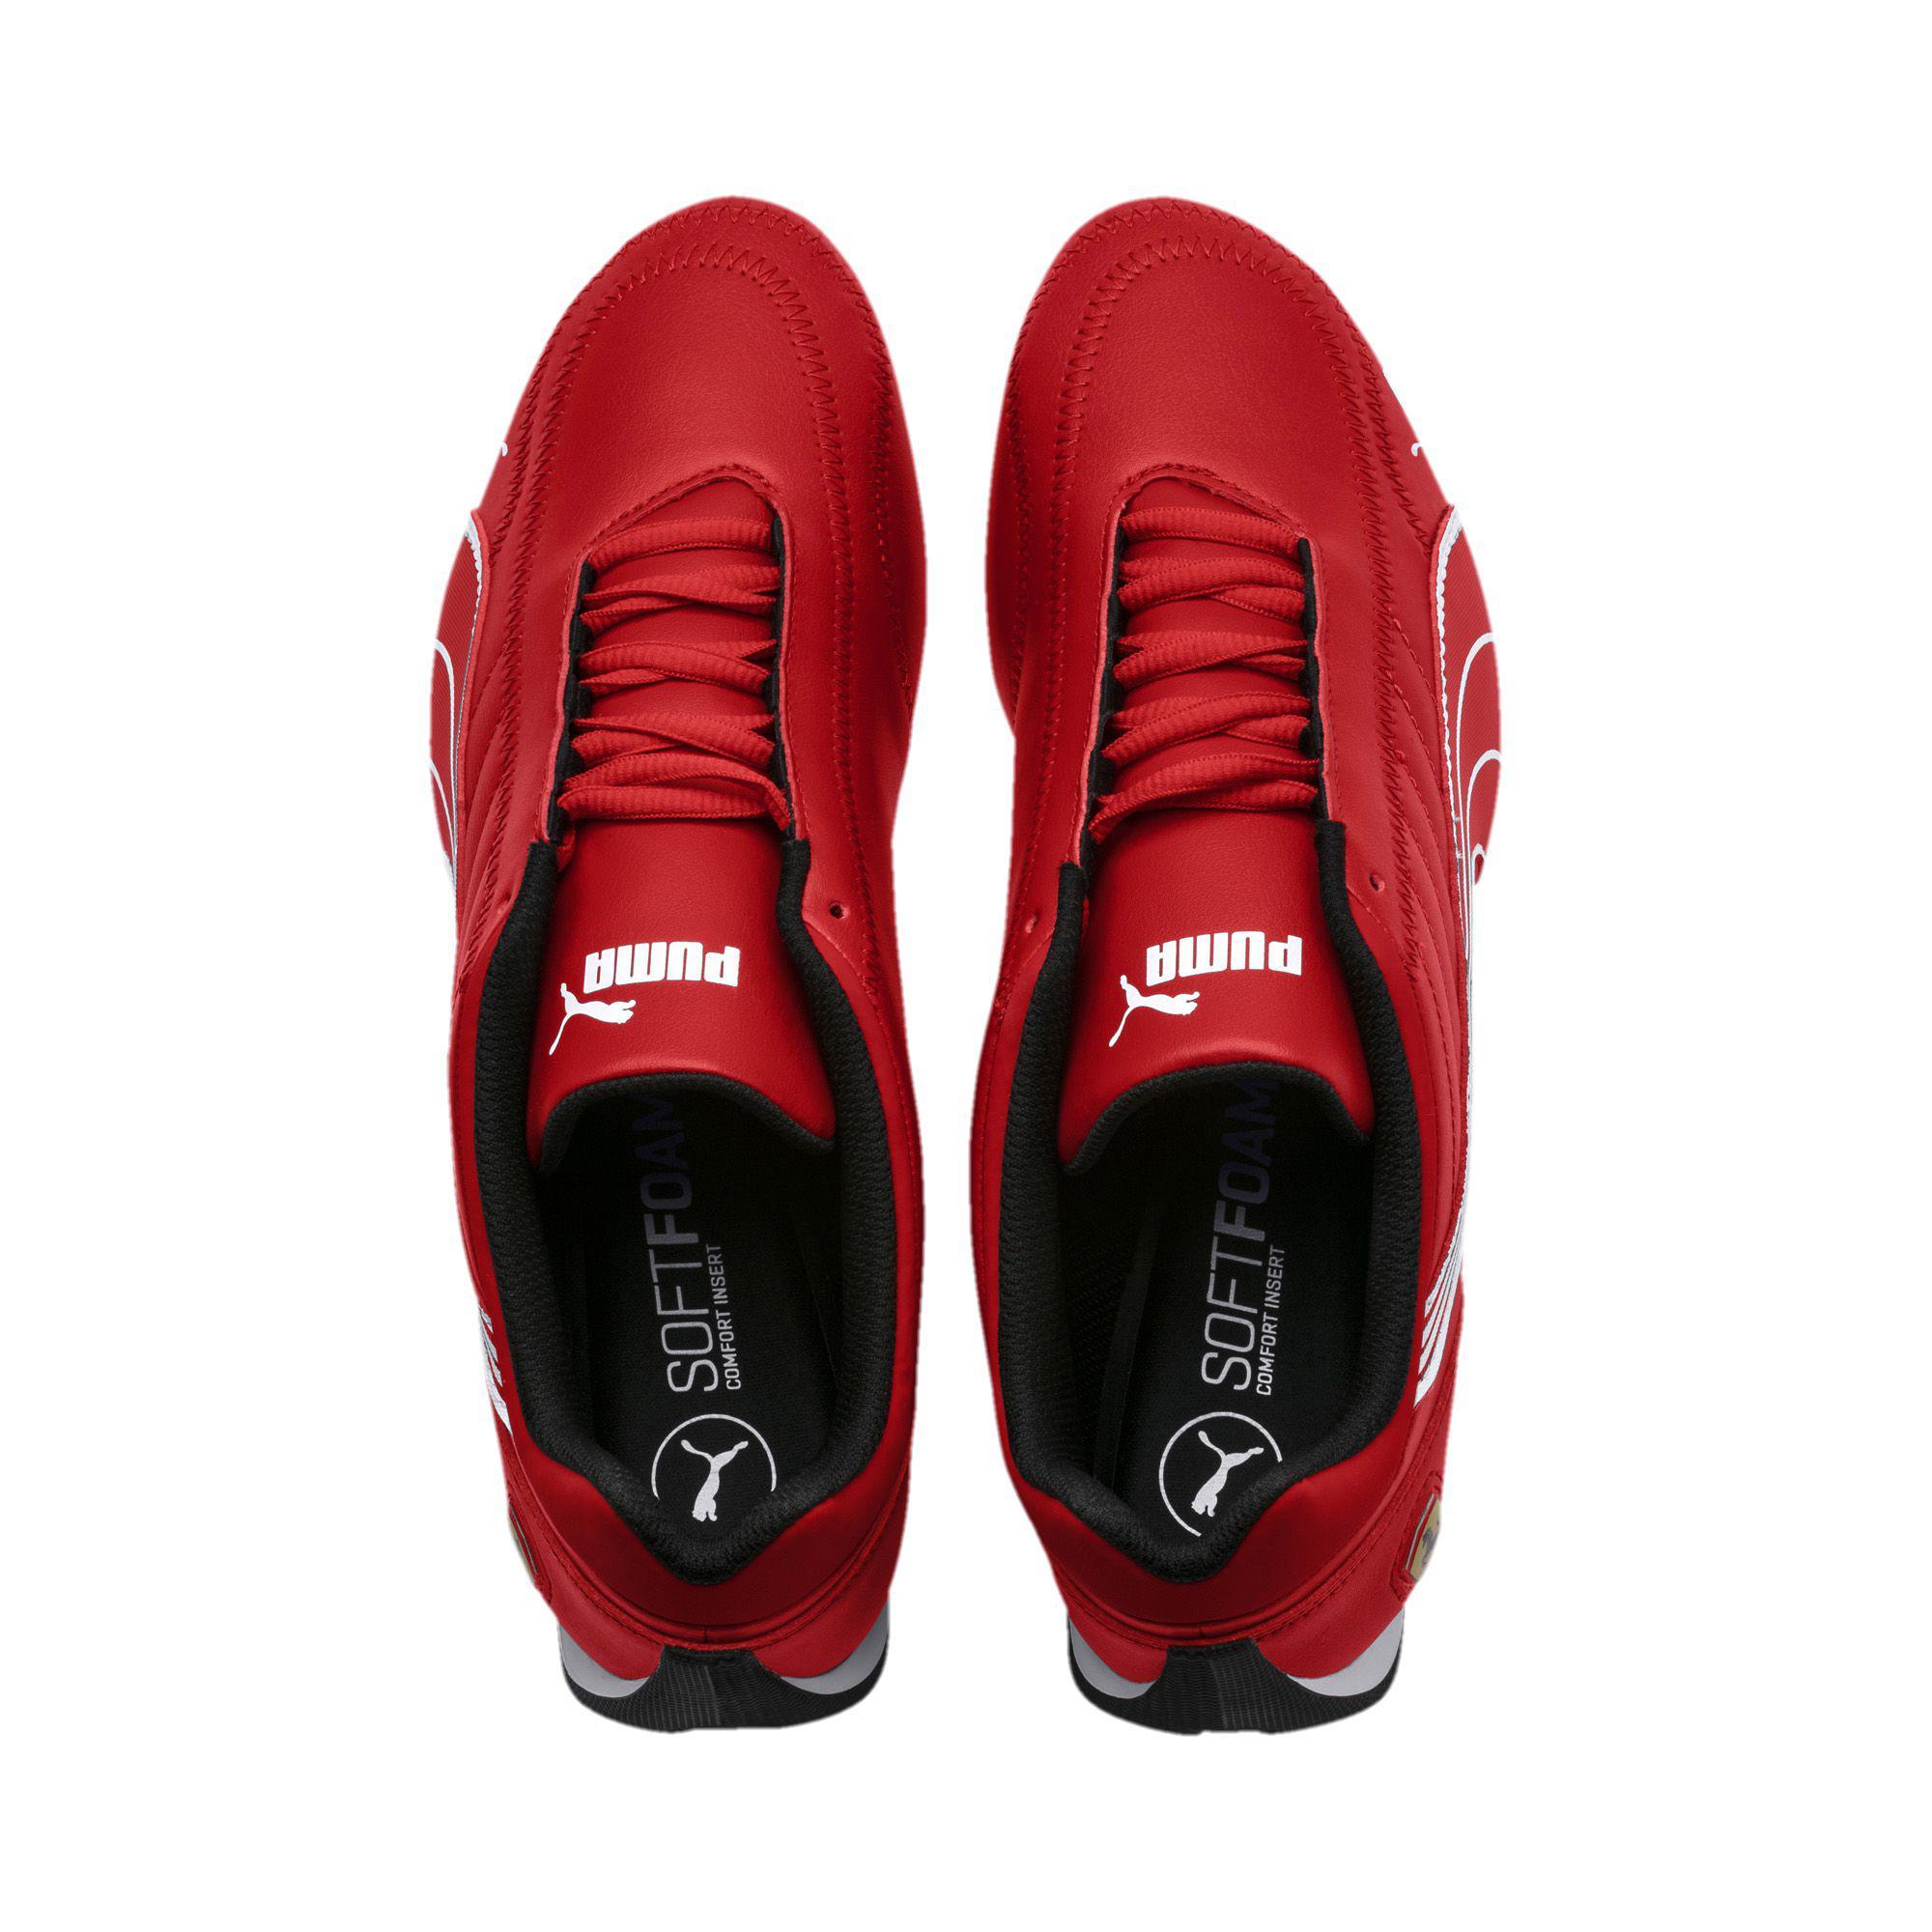 Lyst - PUMA Ferrari Future Cart Cat Men s Motorsport Shoes in Red ... d8c32d556